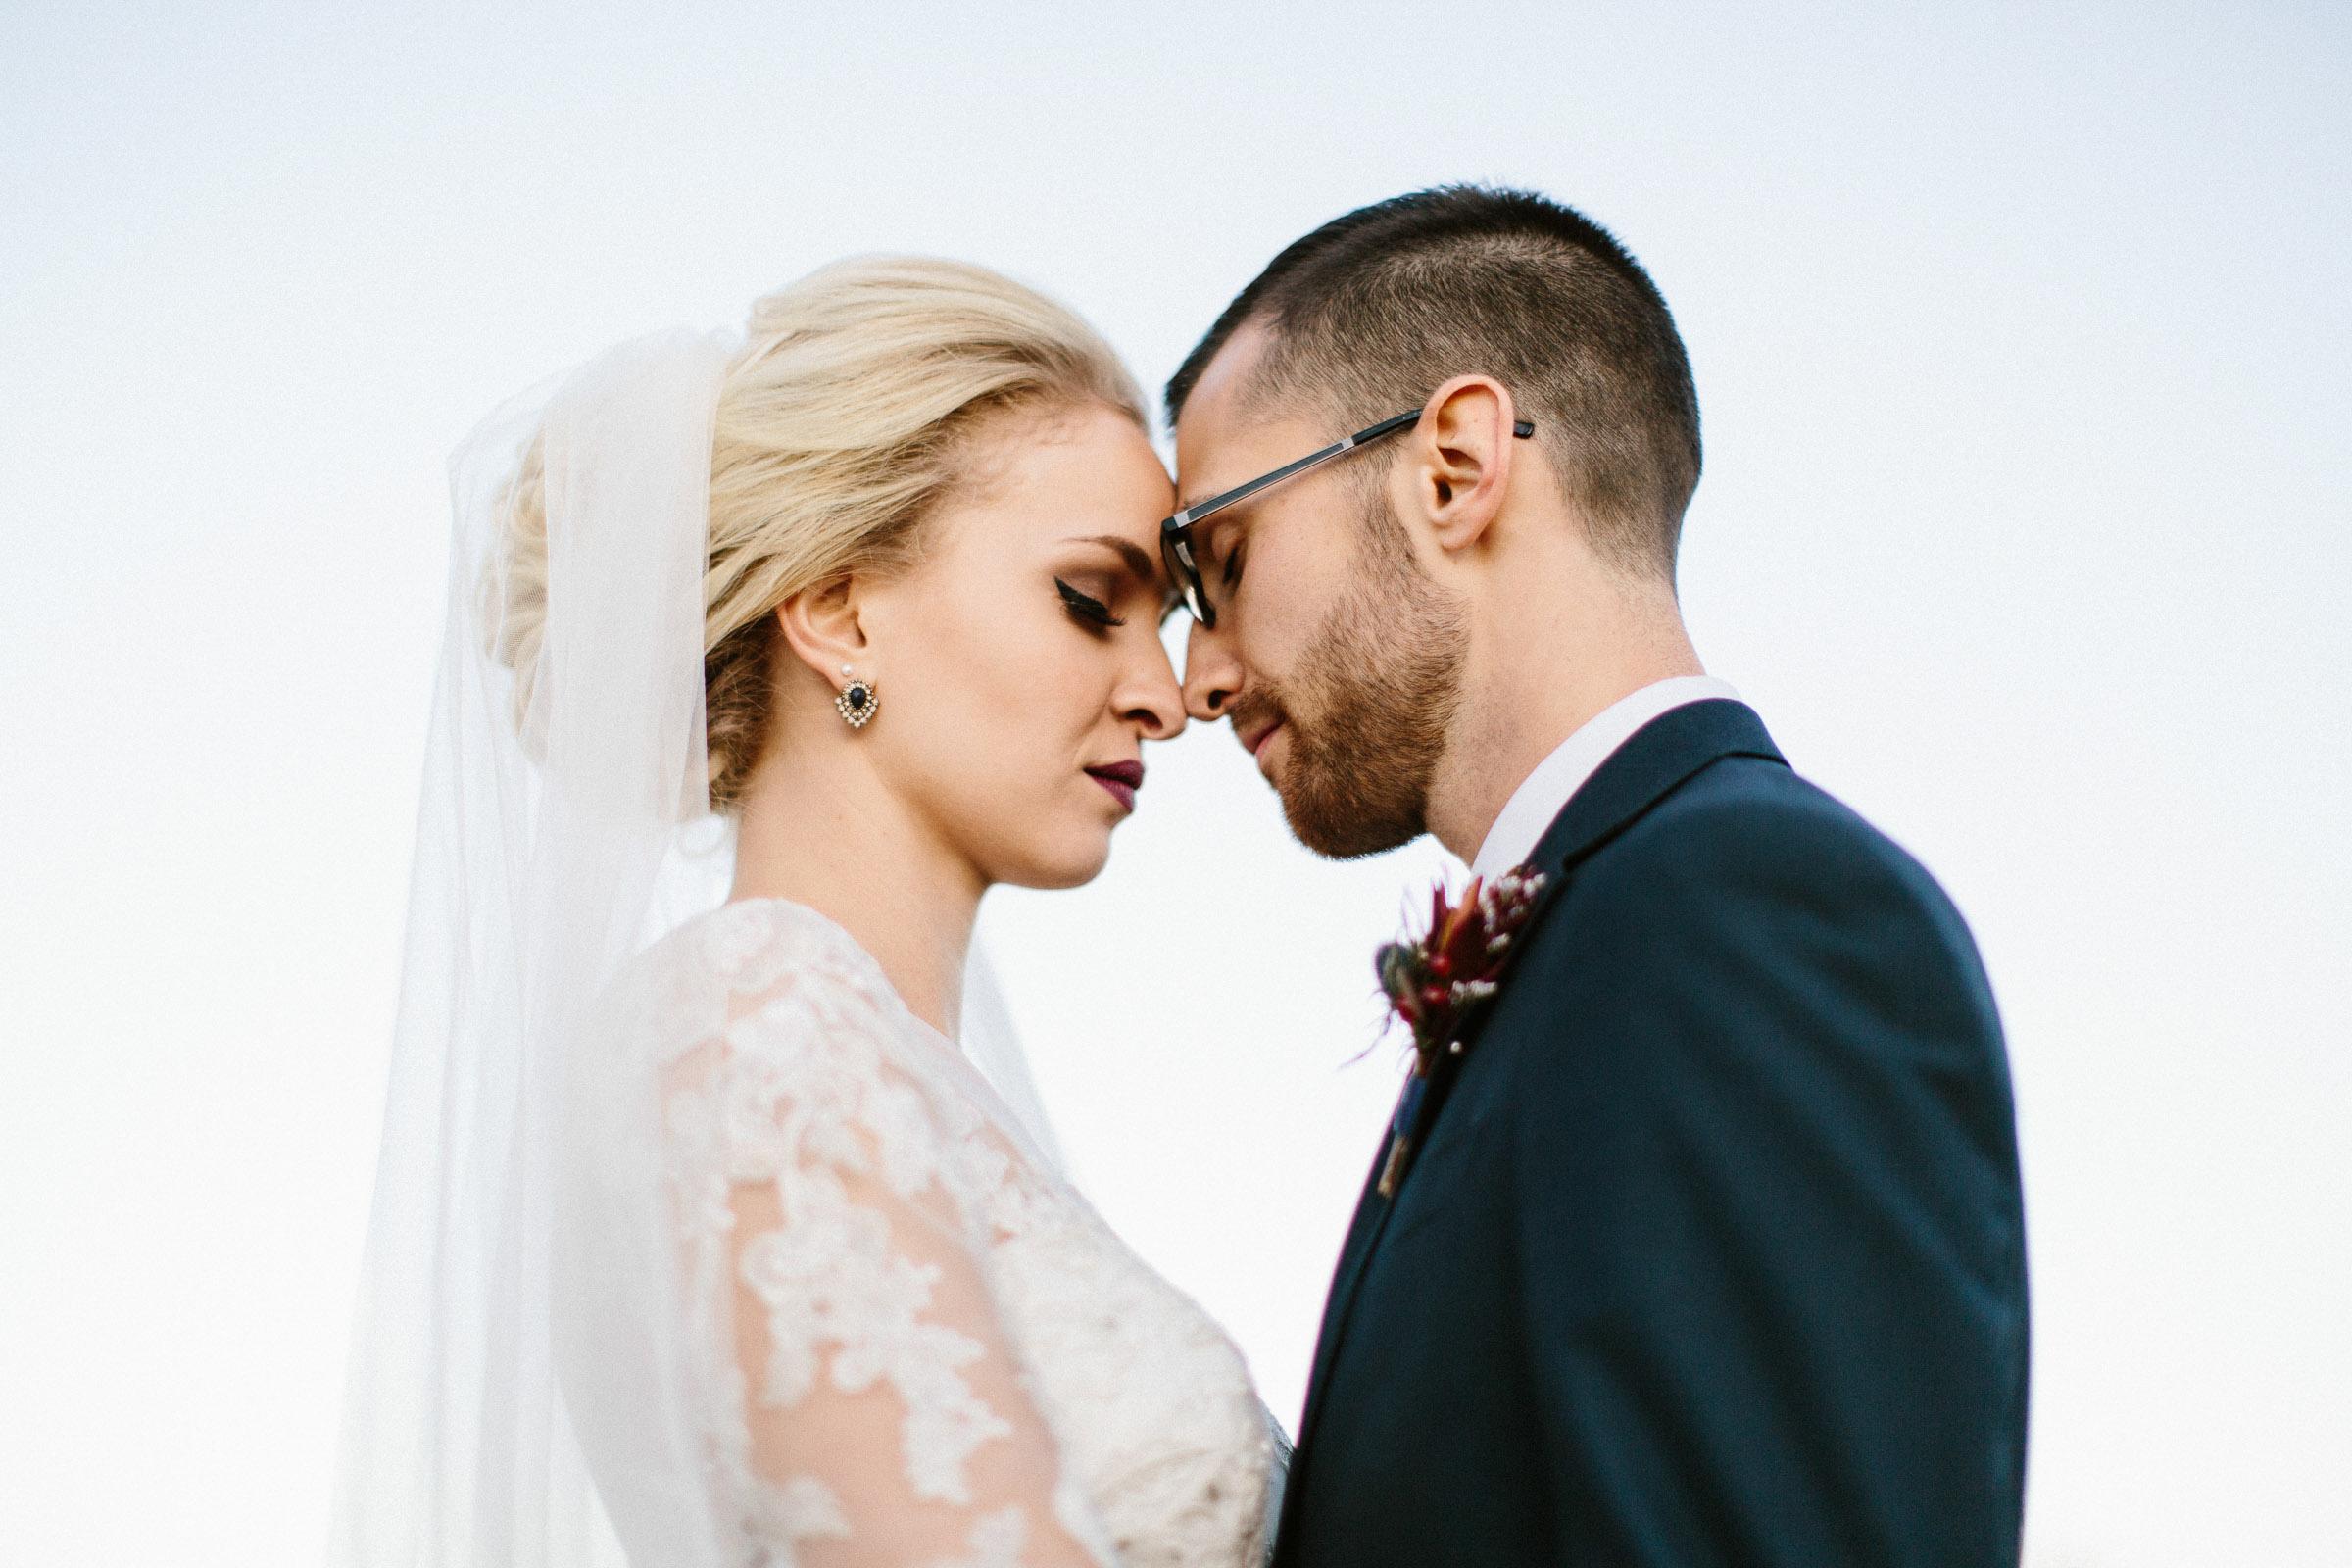 Jenna&Austin_SiouxFalls_Wedding_Photographer_088.jpg